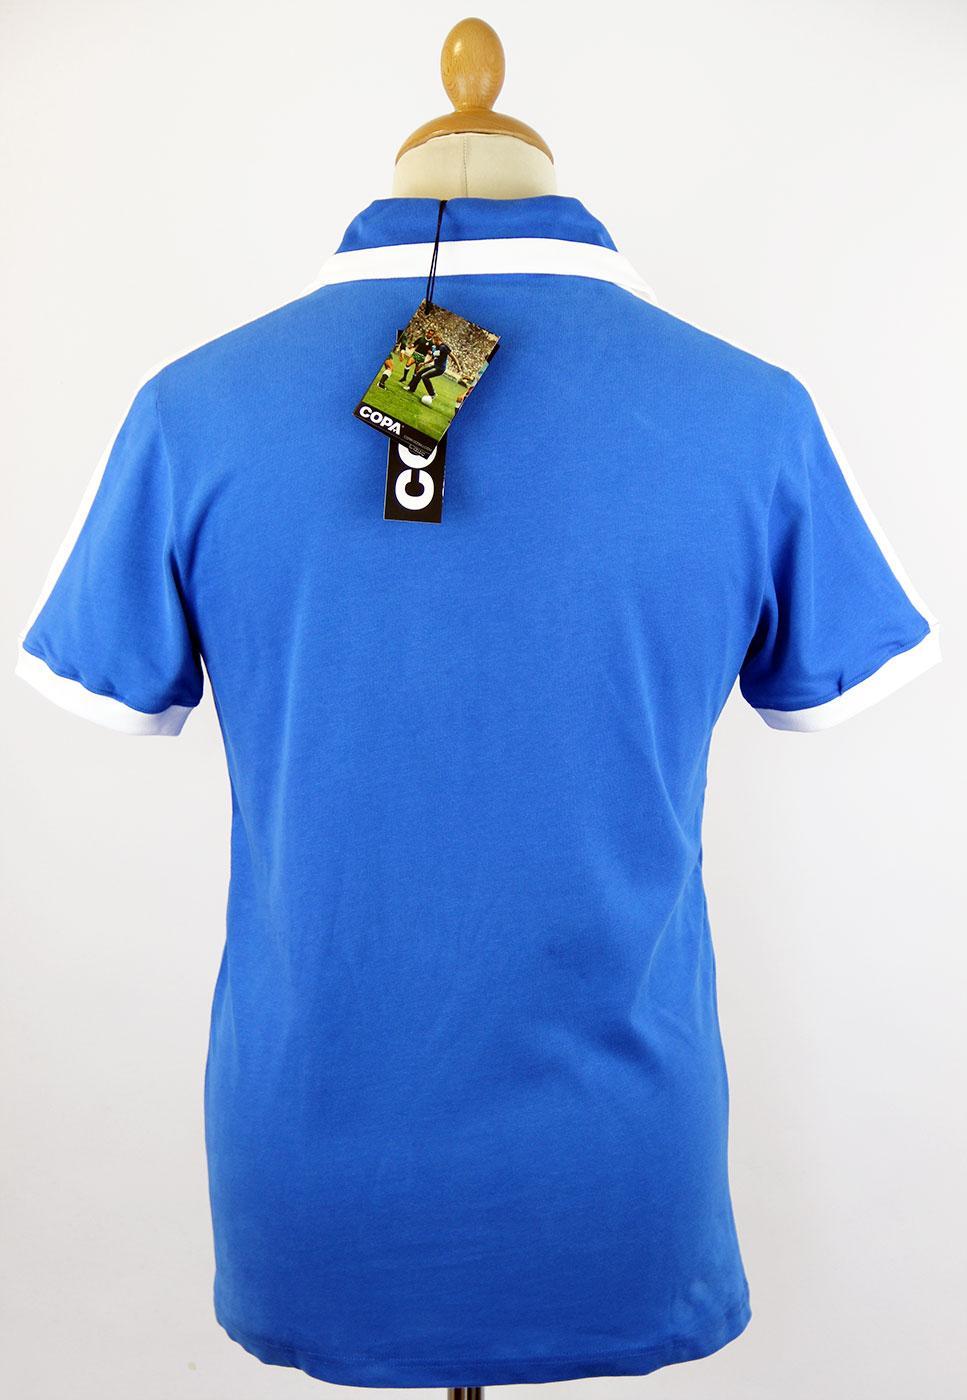 East Germany 1974 Retro Football Shirt Jersey Tee Top Short